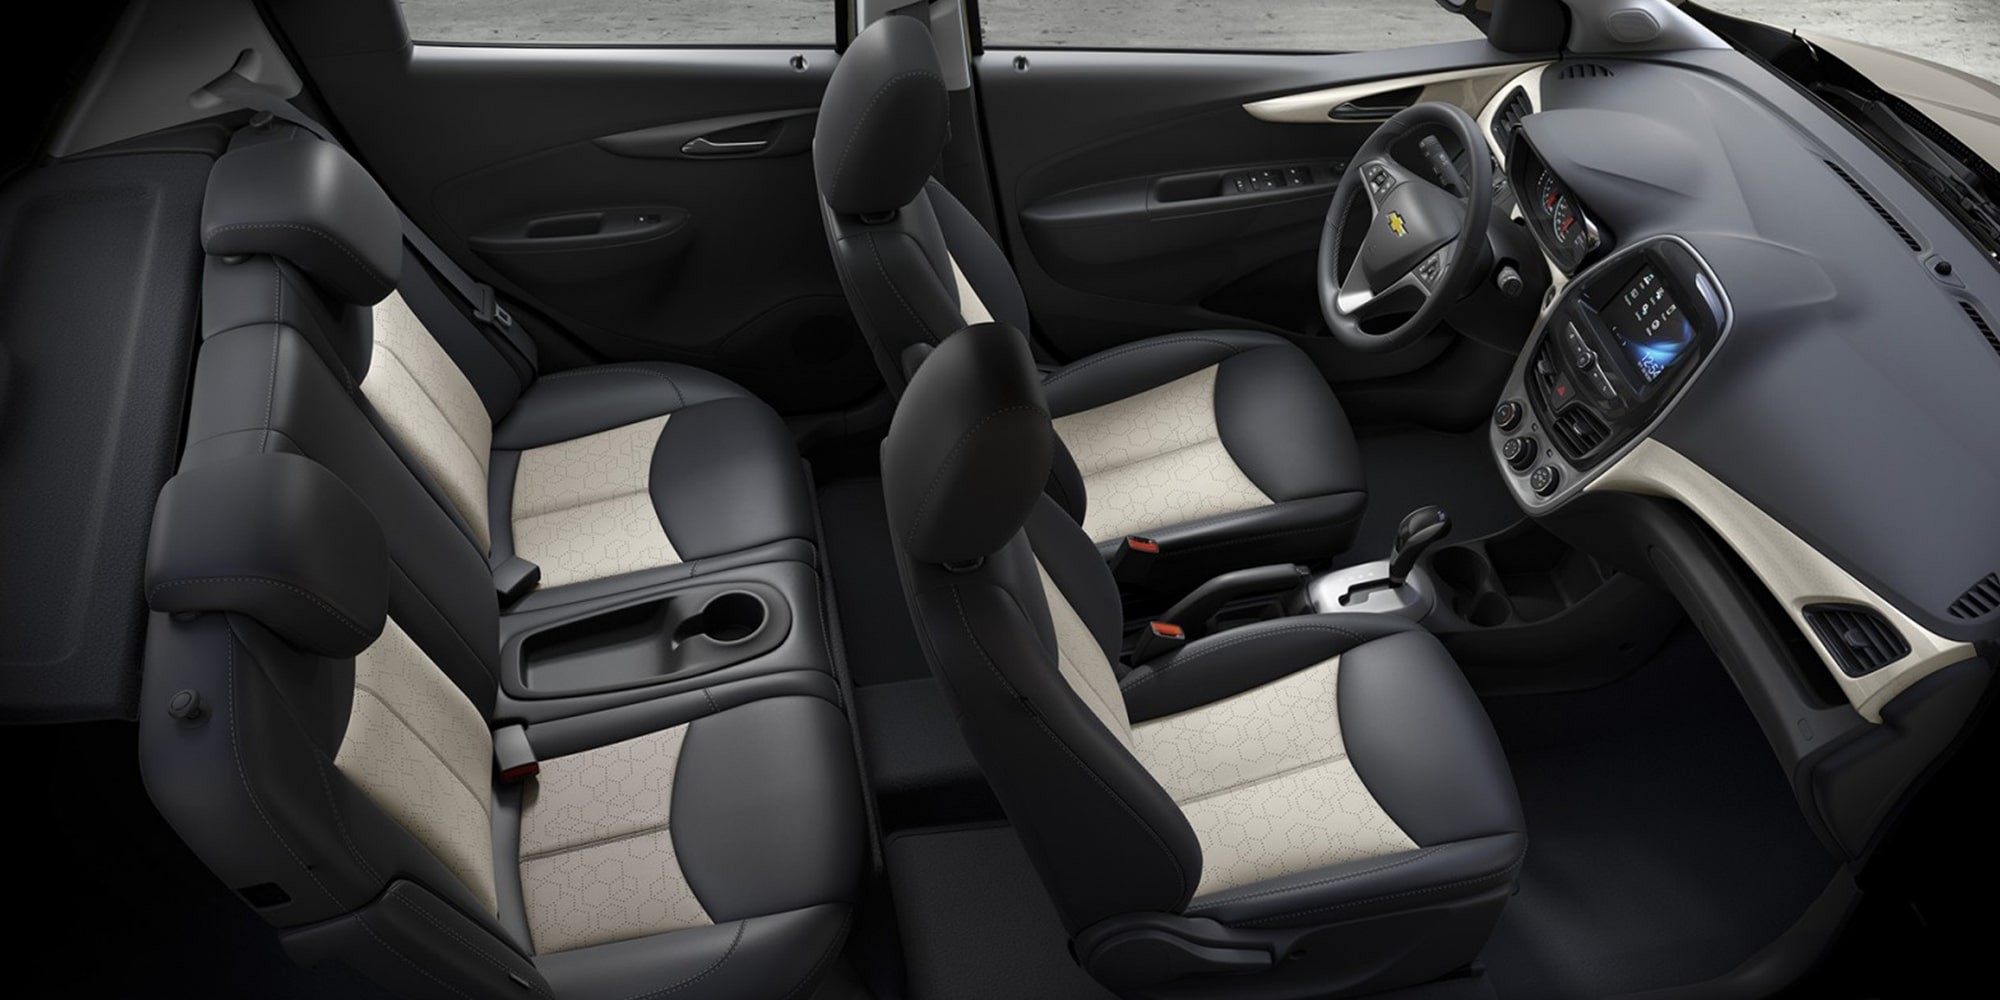 chevrolet 2018 spark city car design interior seats [ 1268 x 634 Pixel ]